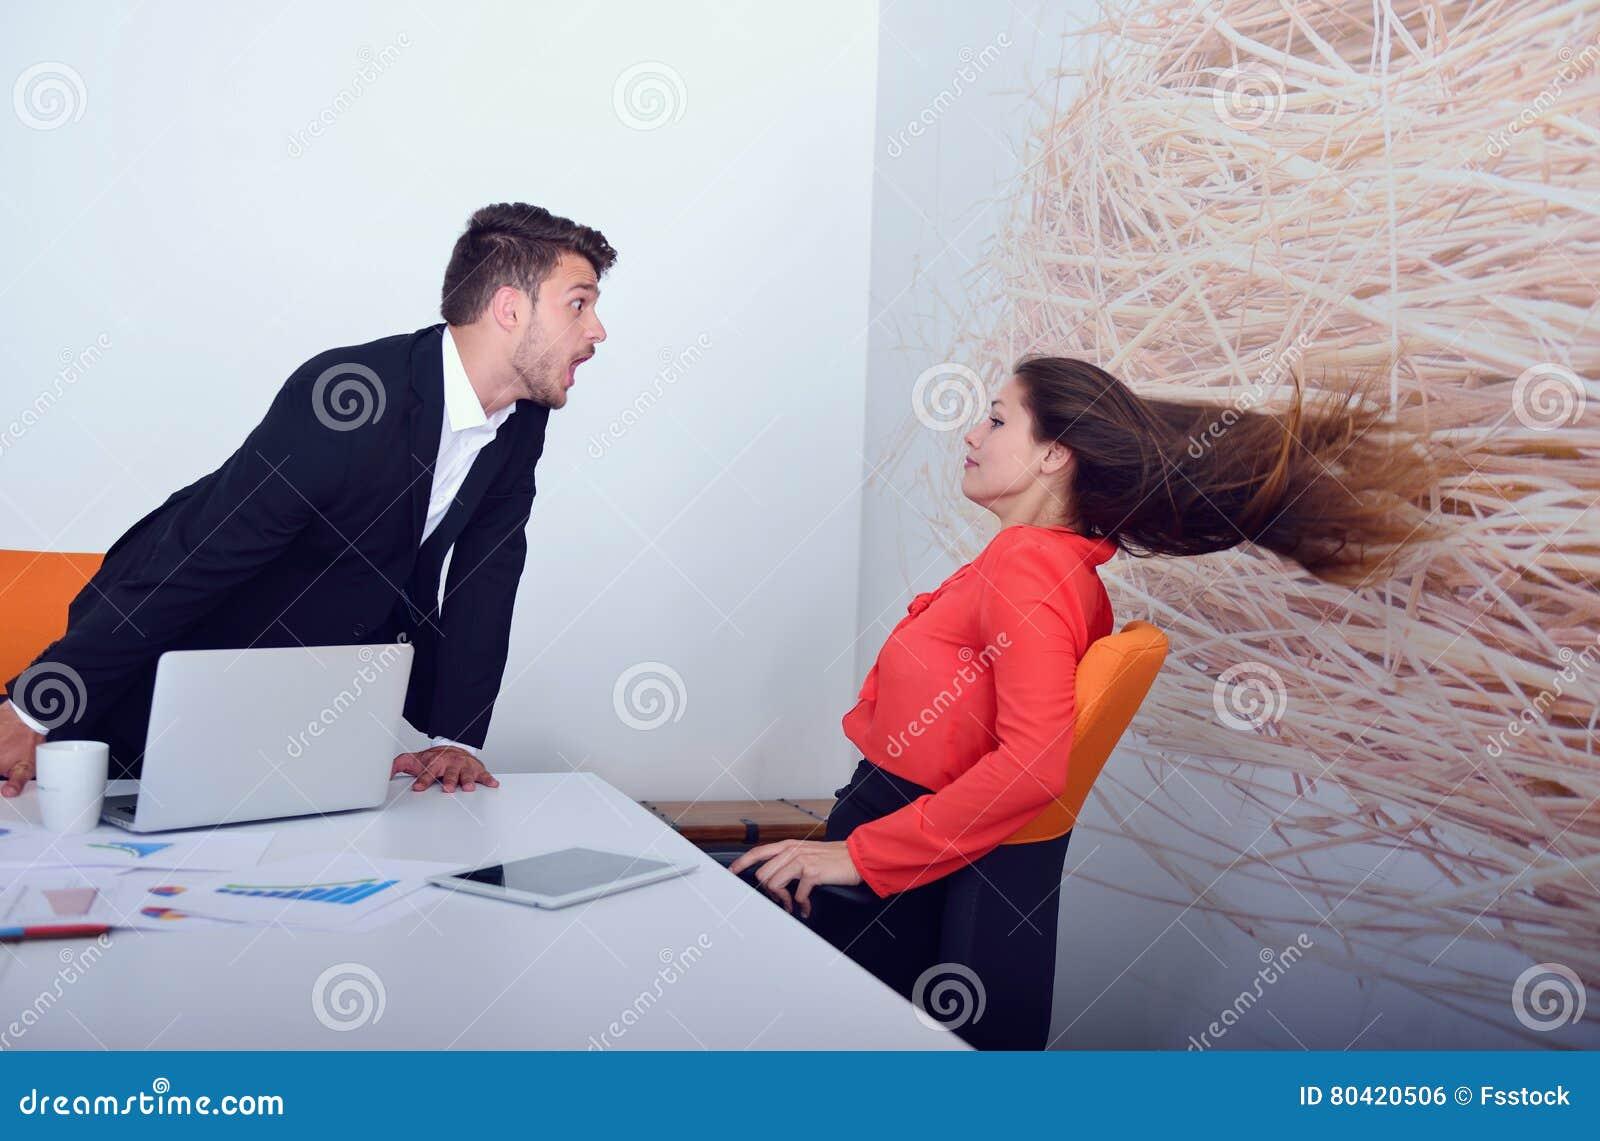 Persone Arrabbiate Immagini.Due Persone Di Affari Arrabbiate Che Discutono